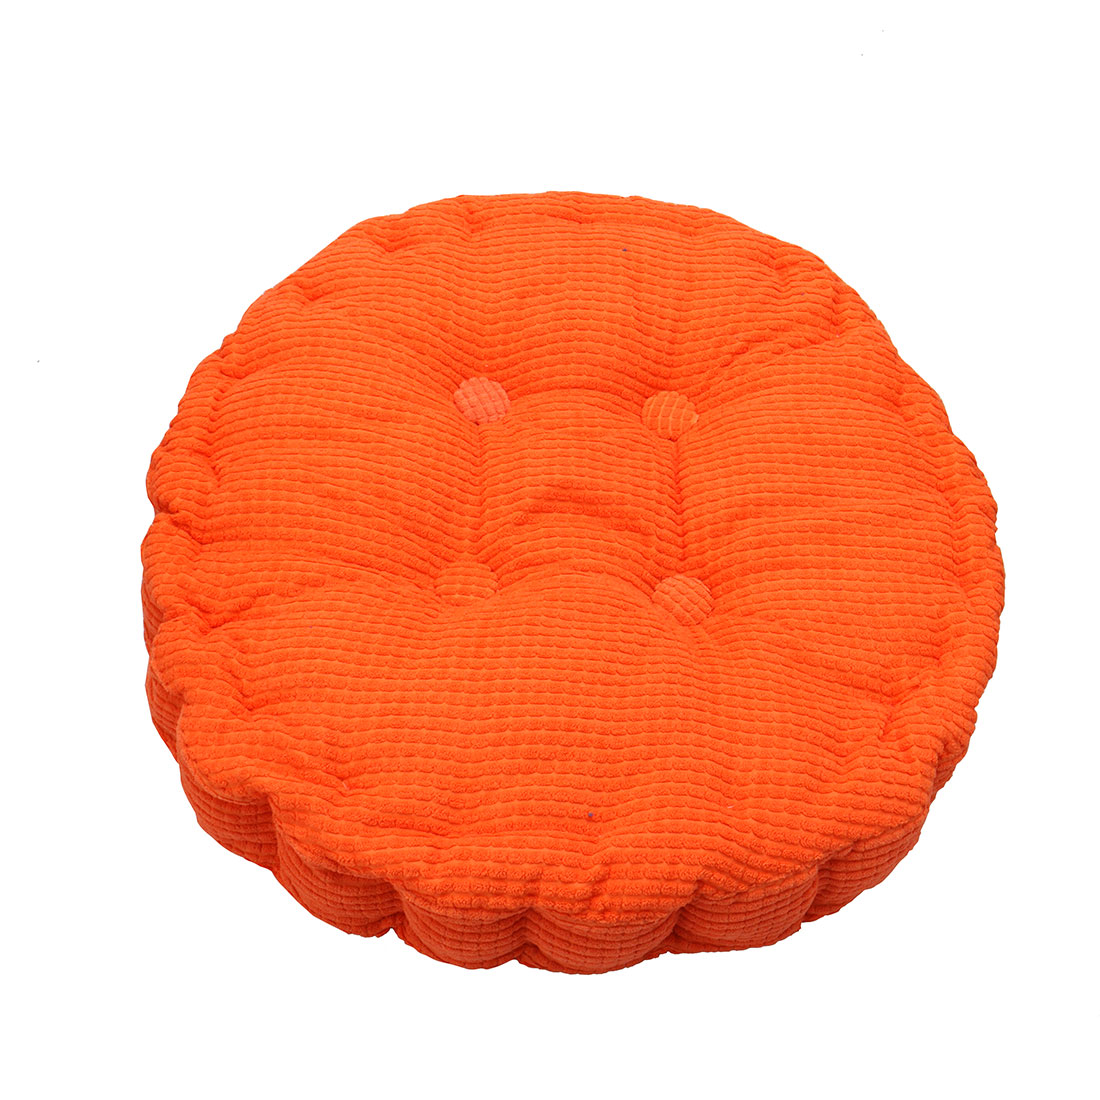 Home Office Corduroy Round Shaped Sofa Floor Chair Seat Cushion Pad Orange 40cm Dia